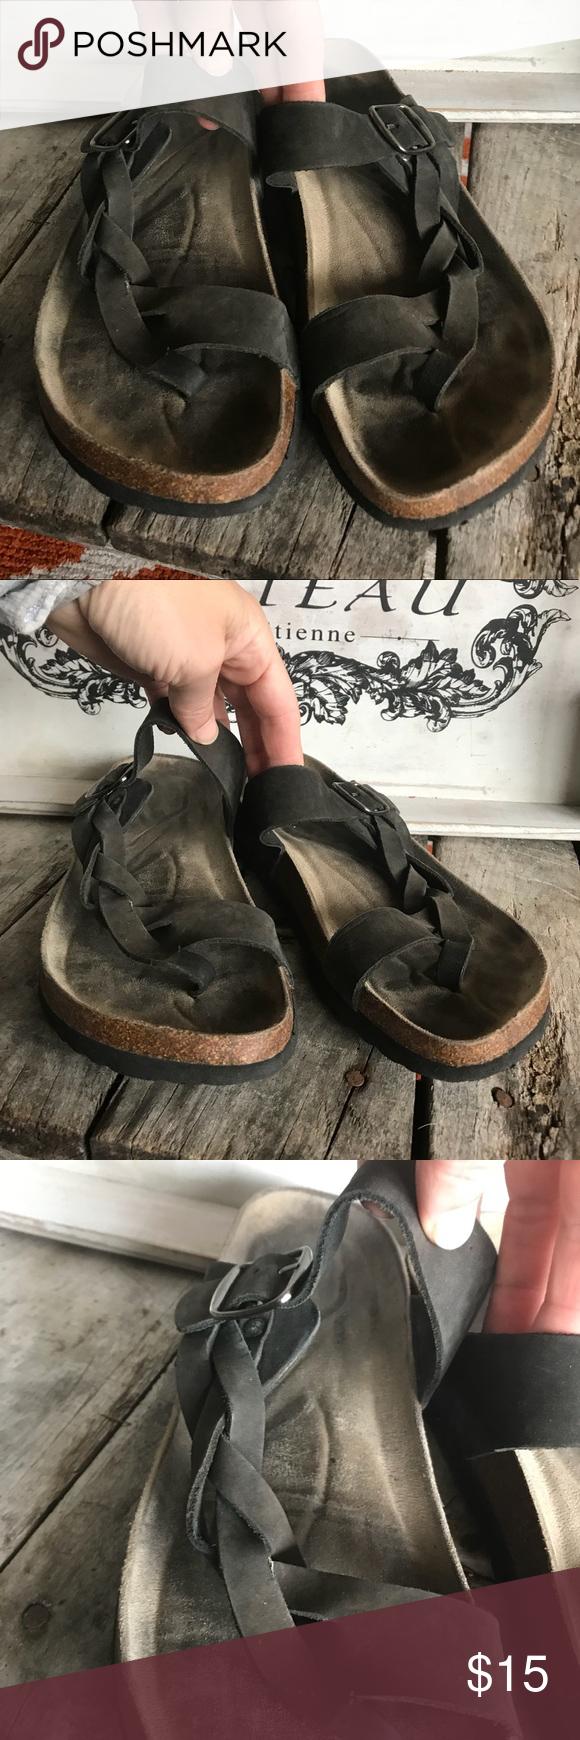 ⭐️White mountain Crawford sandal. Pre